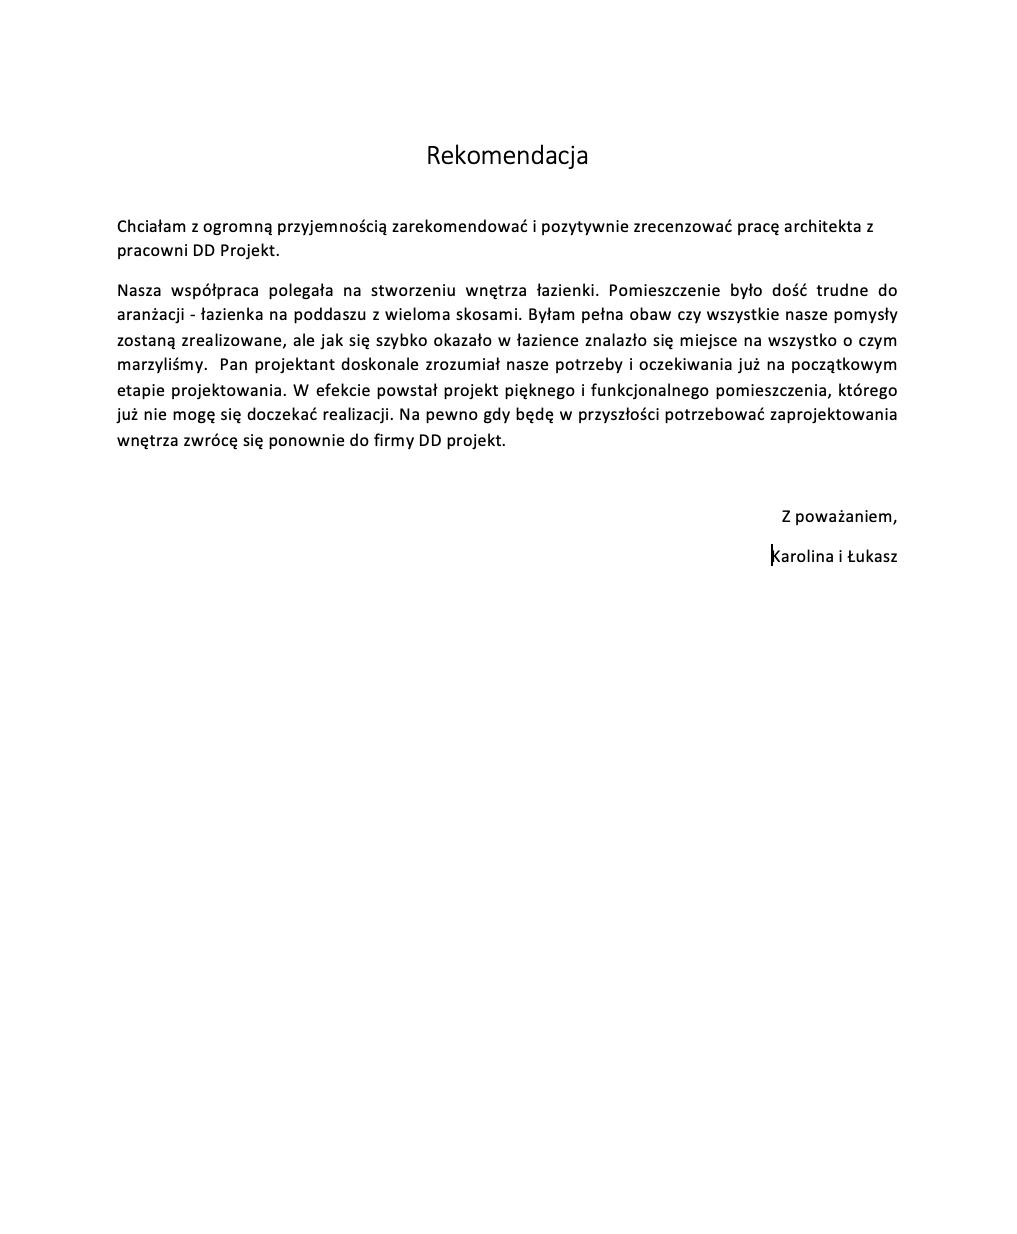 https://ddprojekt.pl/wp-content/uploads/2020/12/Zrzut-ekranu-2020-12-4-o-12.53.36-1.png